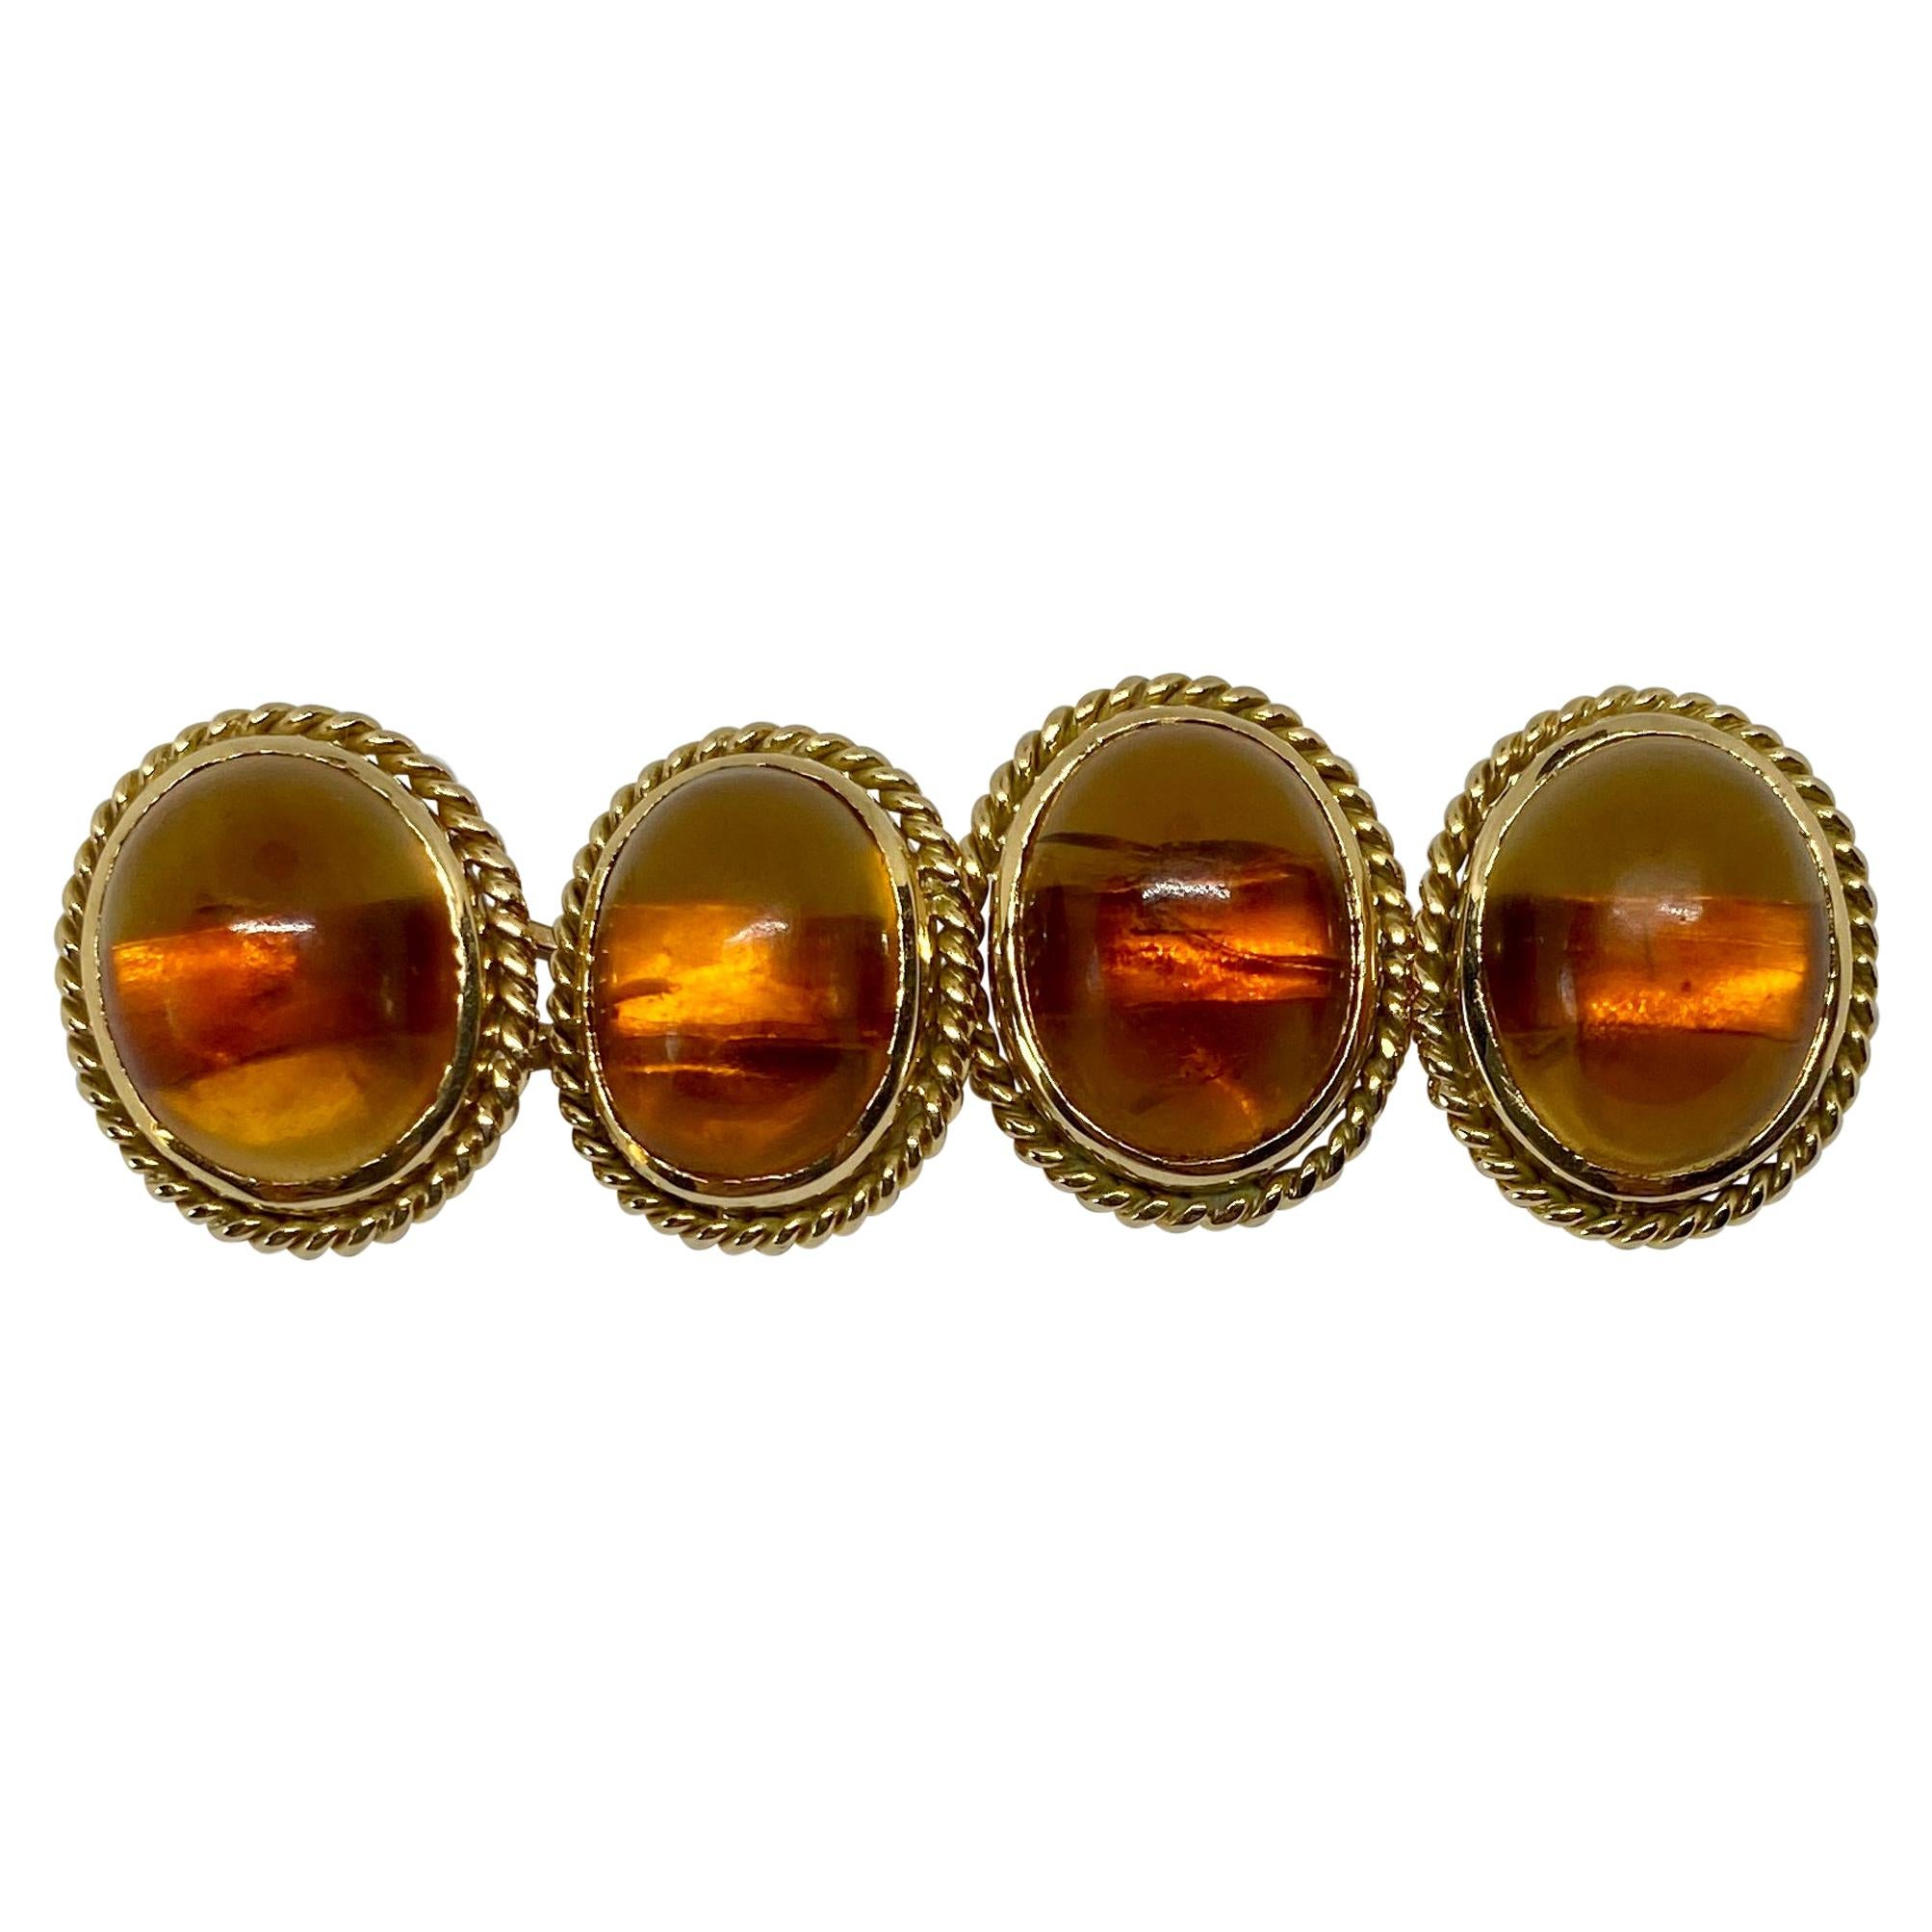 Antique 18 Karat Yellow Gold and Amber Cufflinks